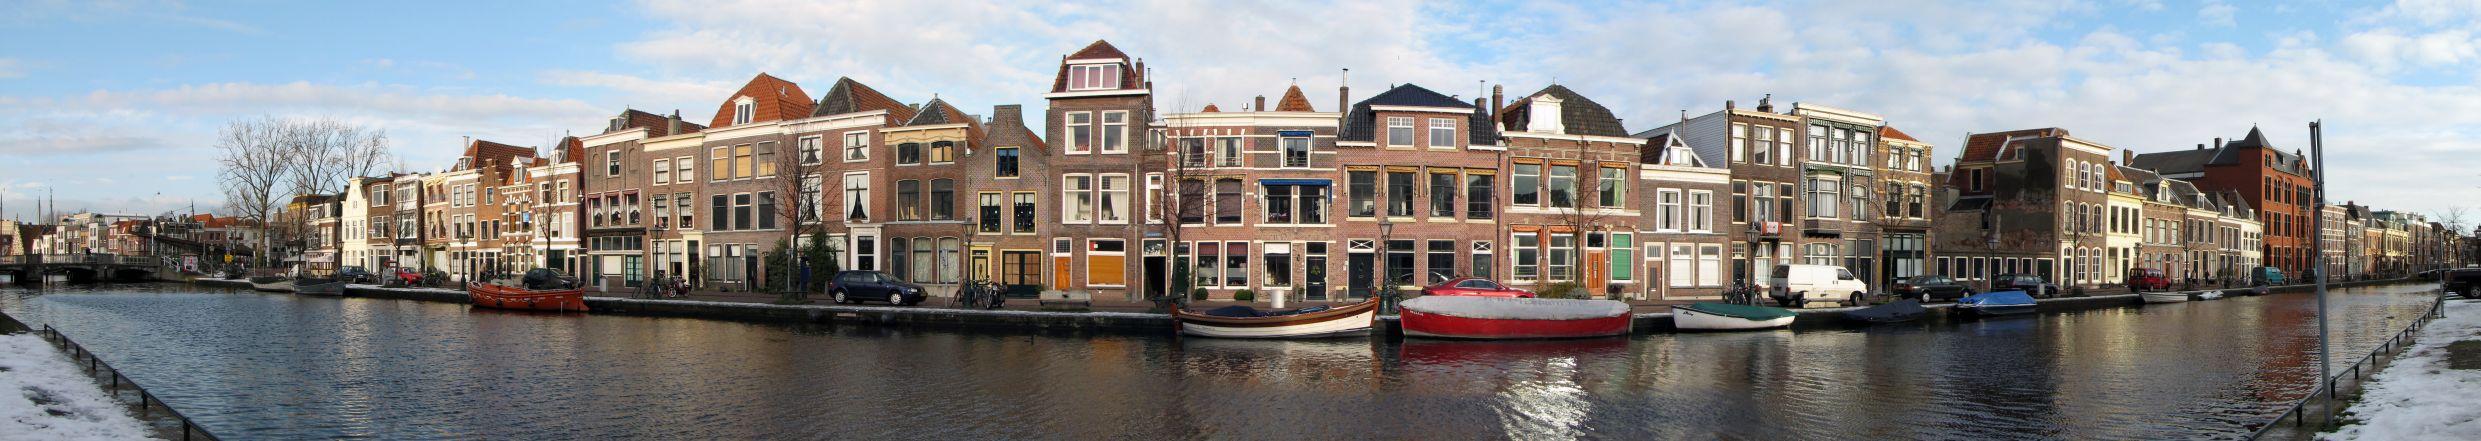 Panorama of Leiden